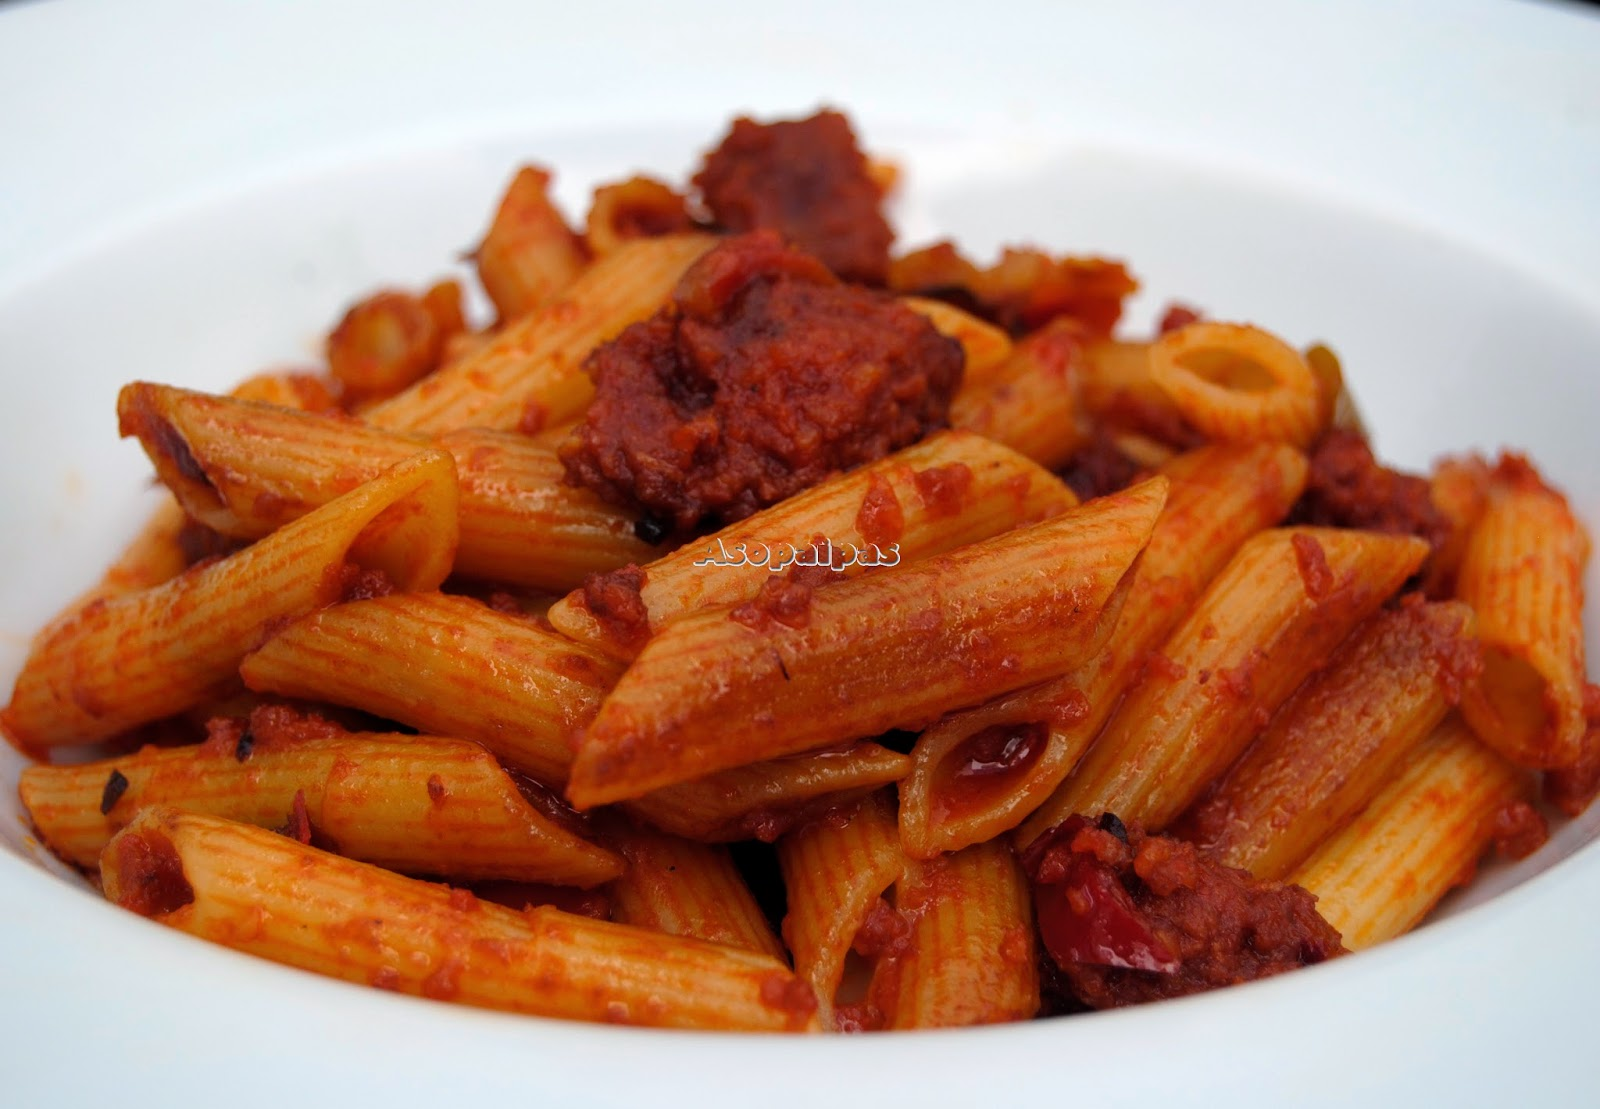 Macarrones con sobrasada receta asopaipas recetas de for Recetas cocina casera